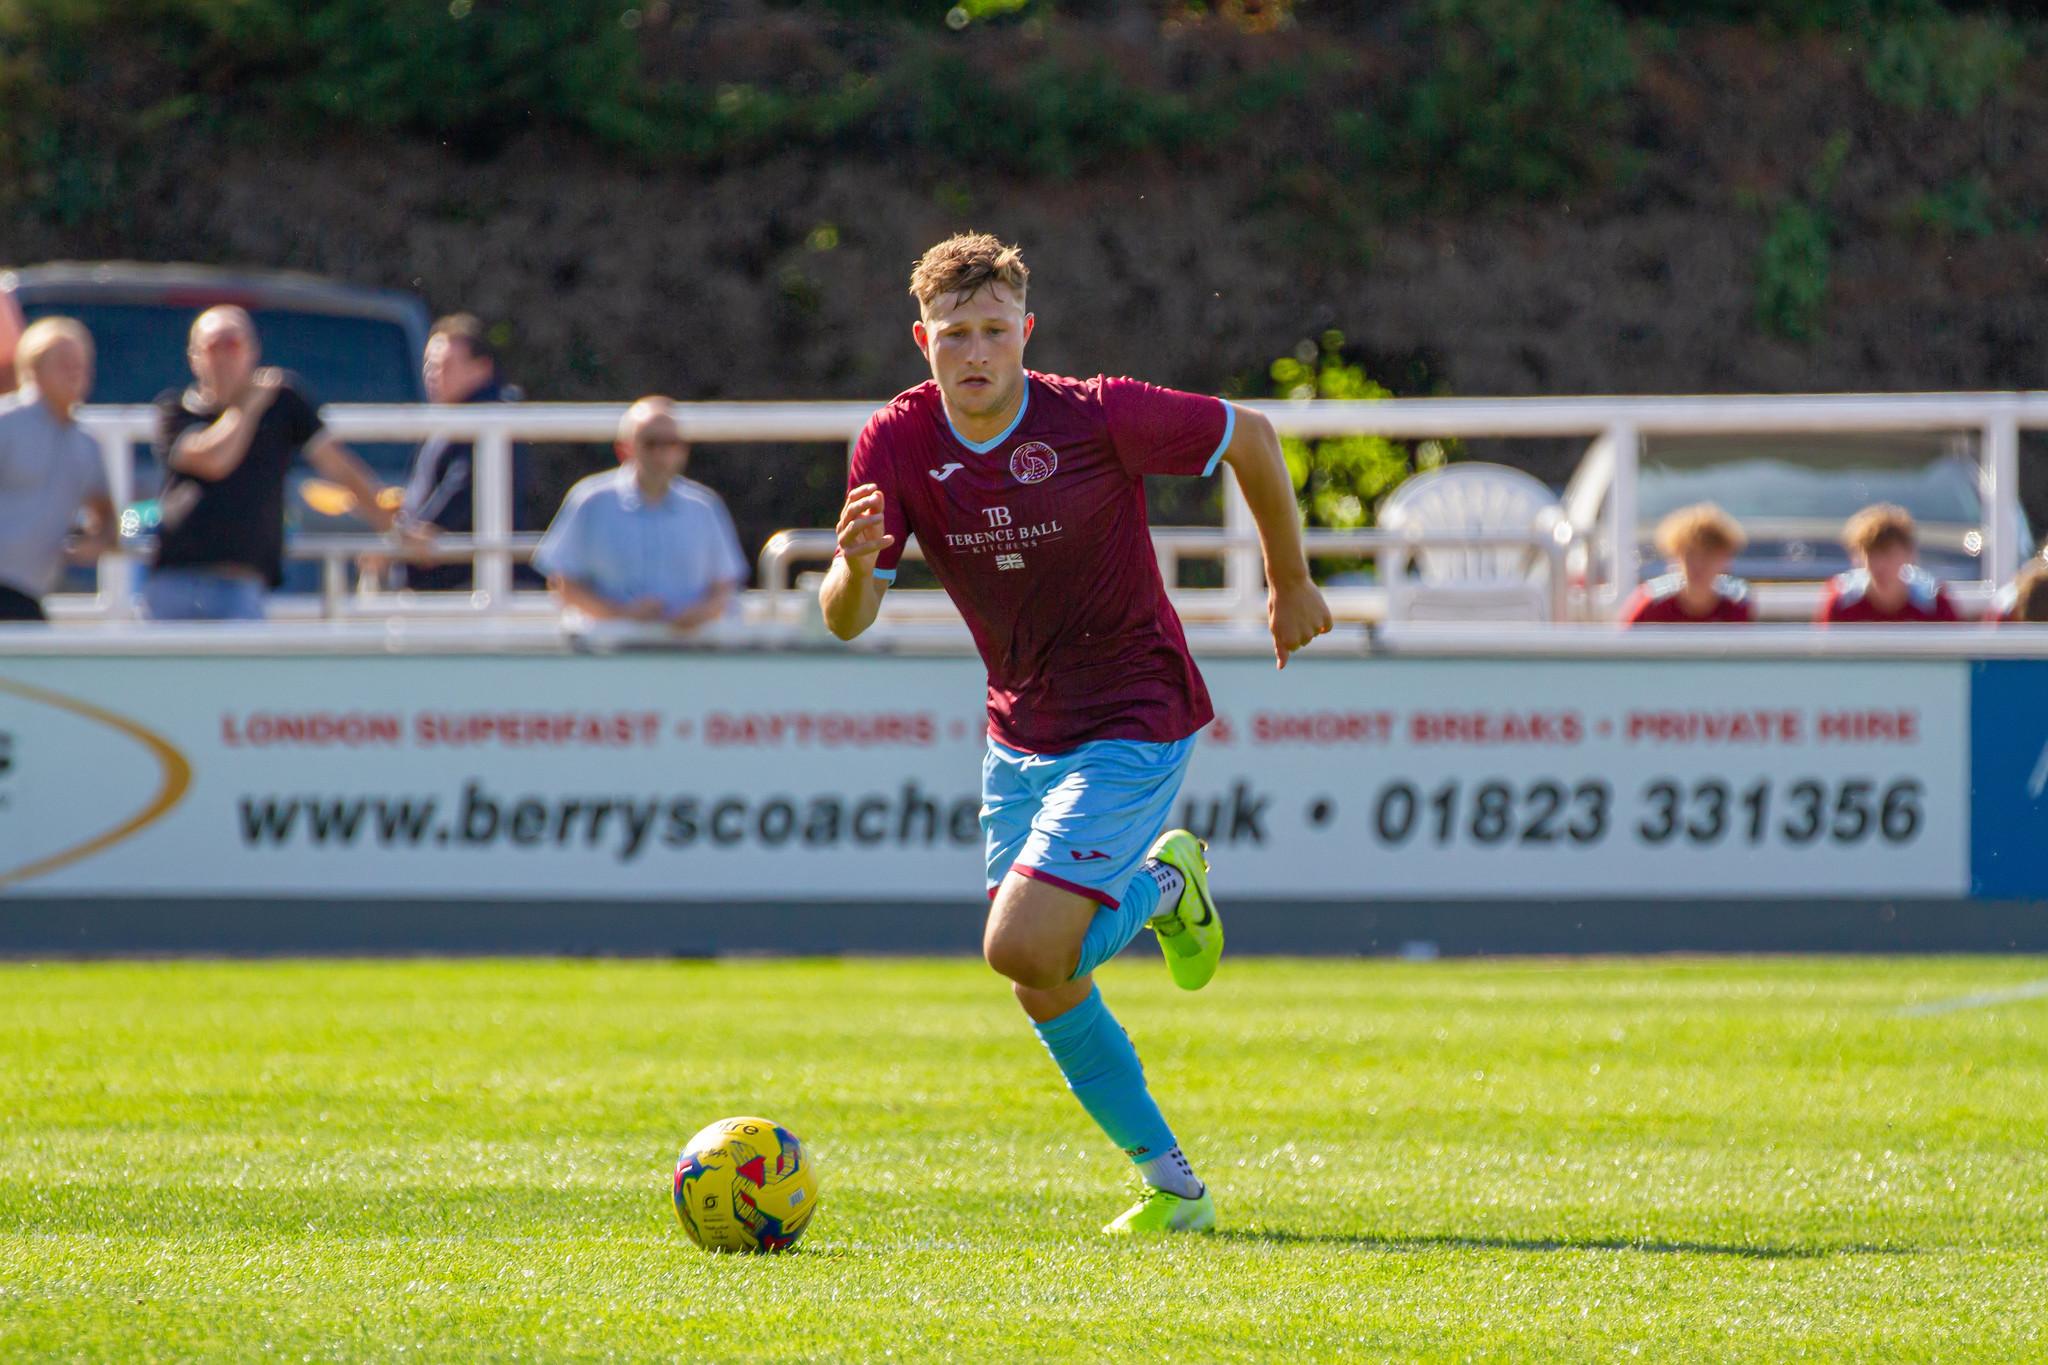 FOOTBALL: Focus on Taunton Town wing-backs Jamie Short and Shane White